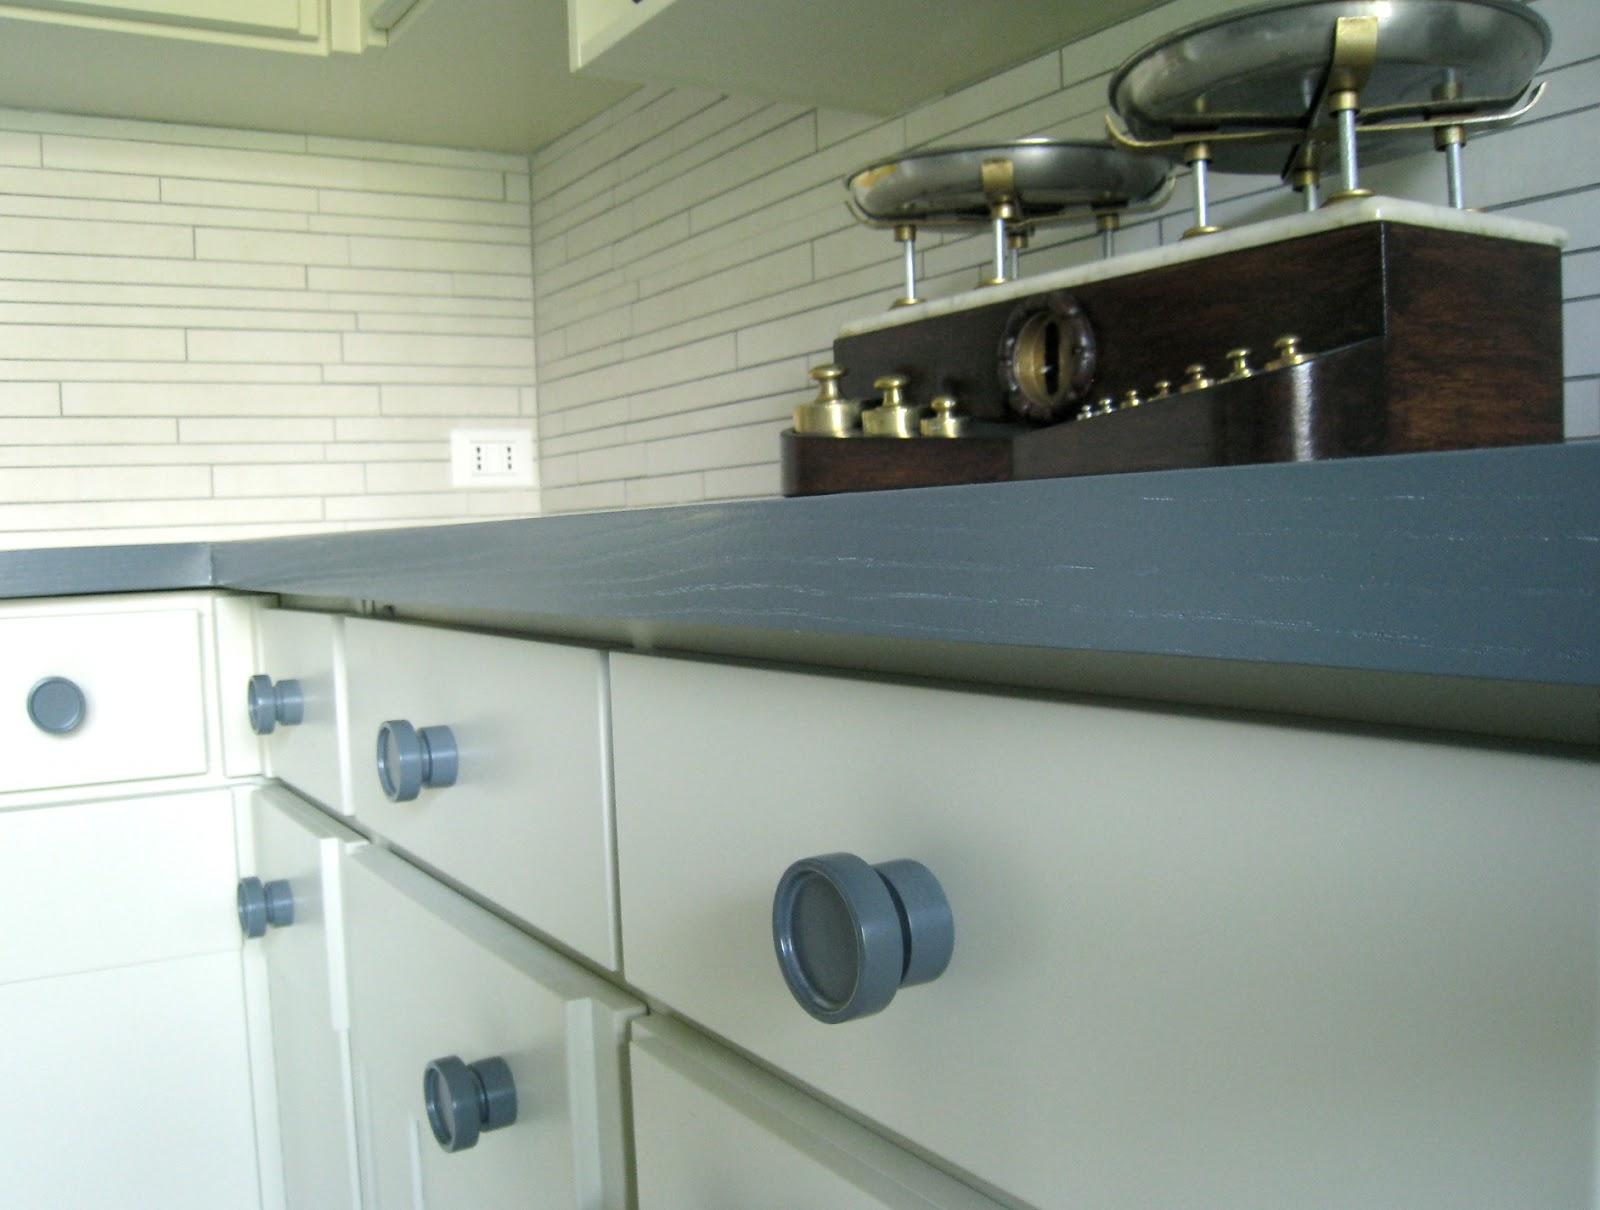 Dipingere la cucina dipingere mobili cucina upowerbiz upowerbiz